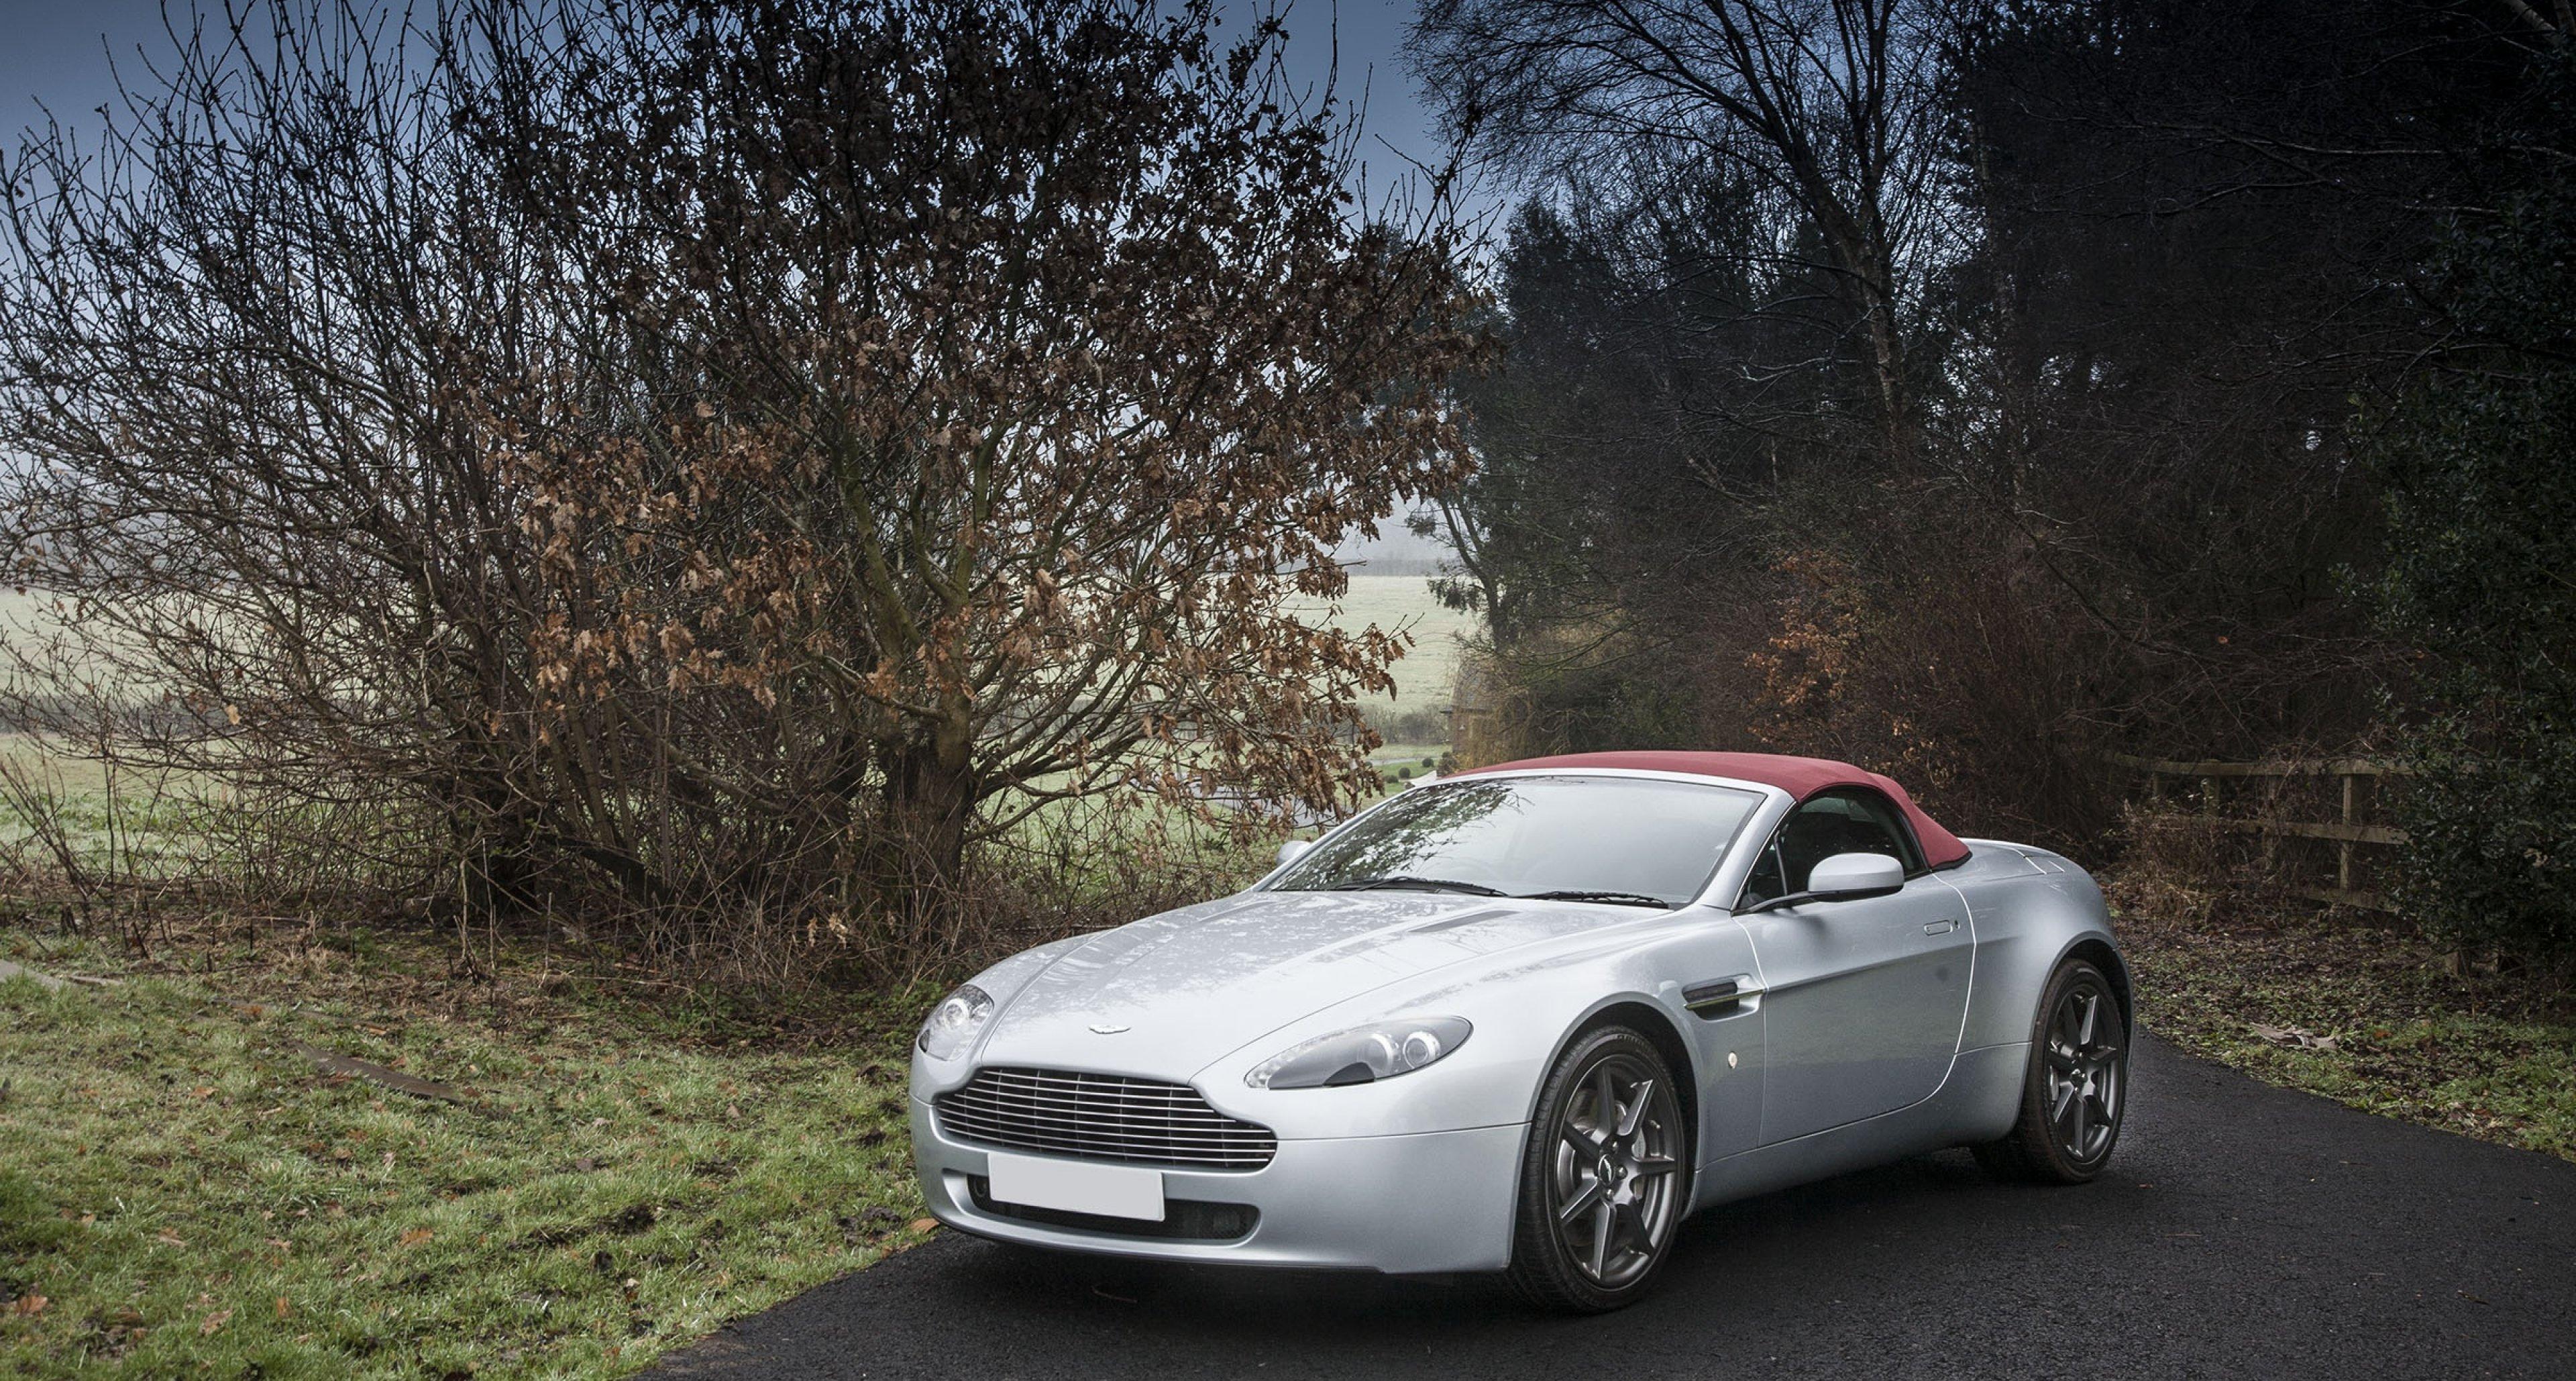 aston martin sale. 2009 Aston Martin V8 Vantage Sale